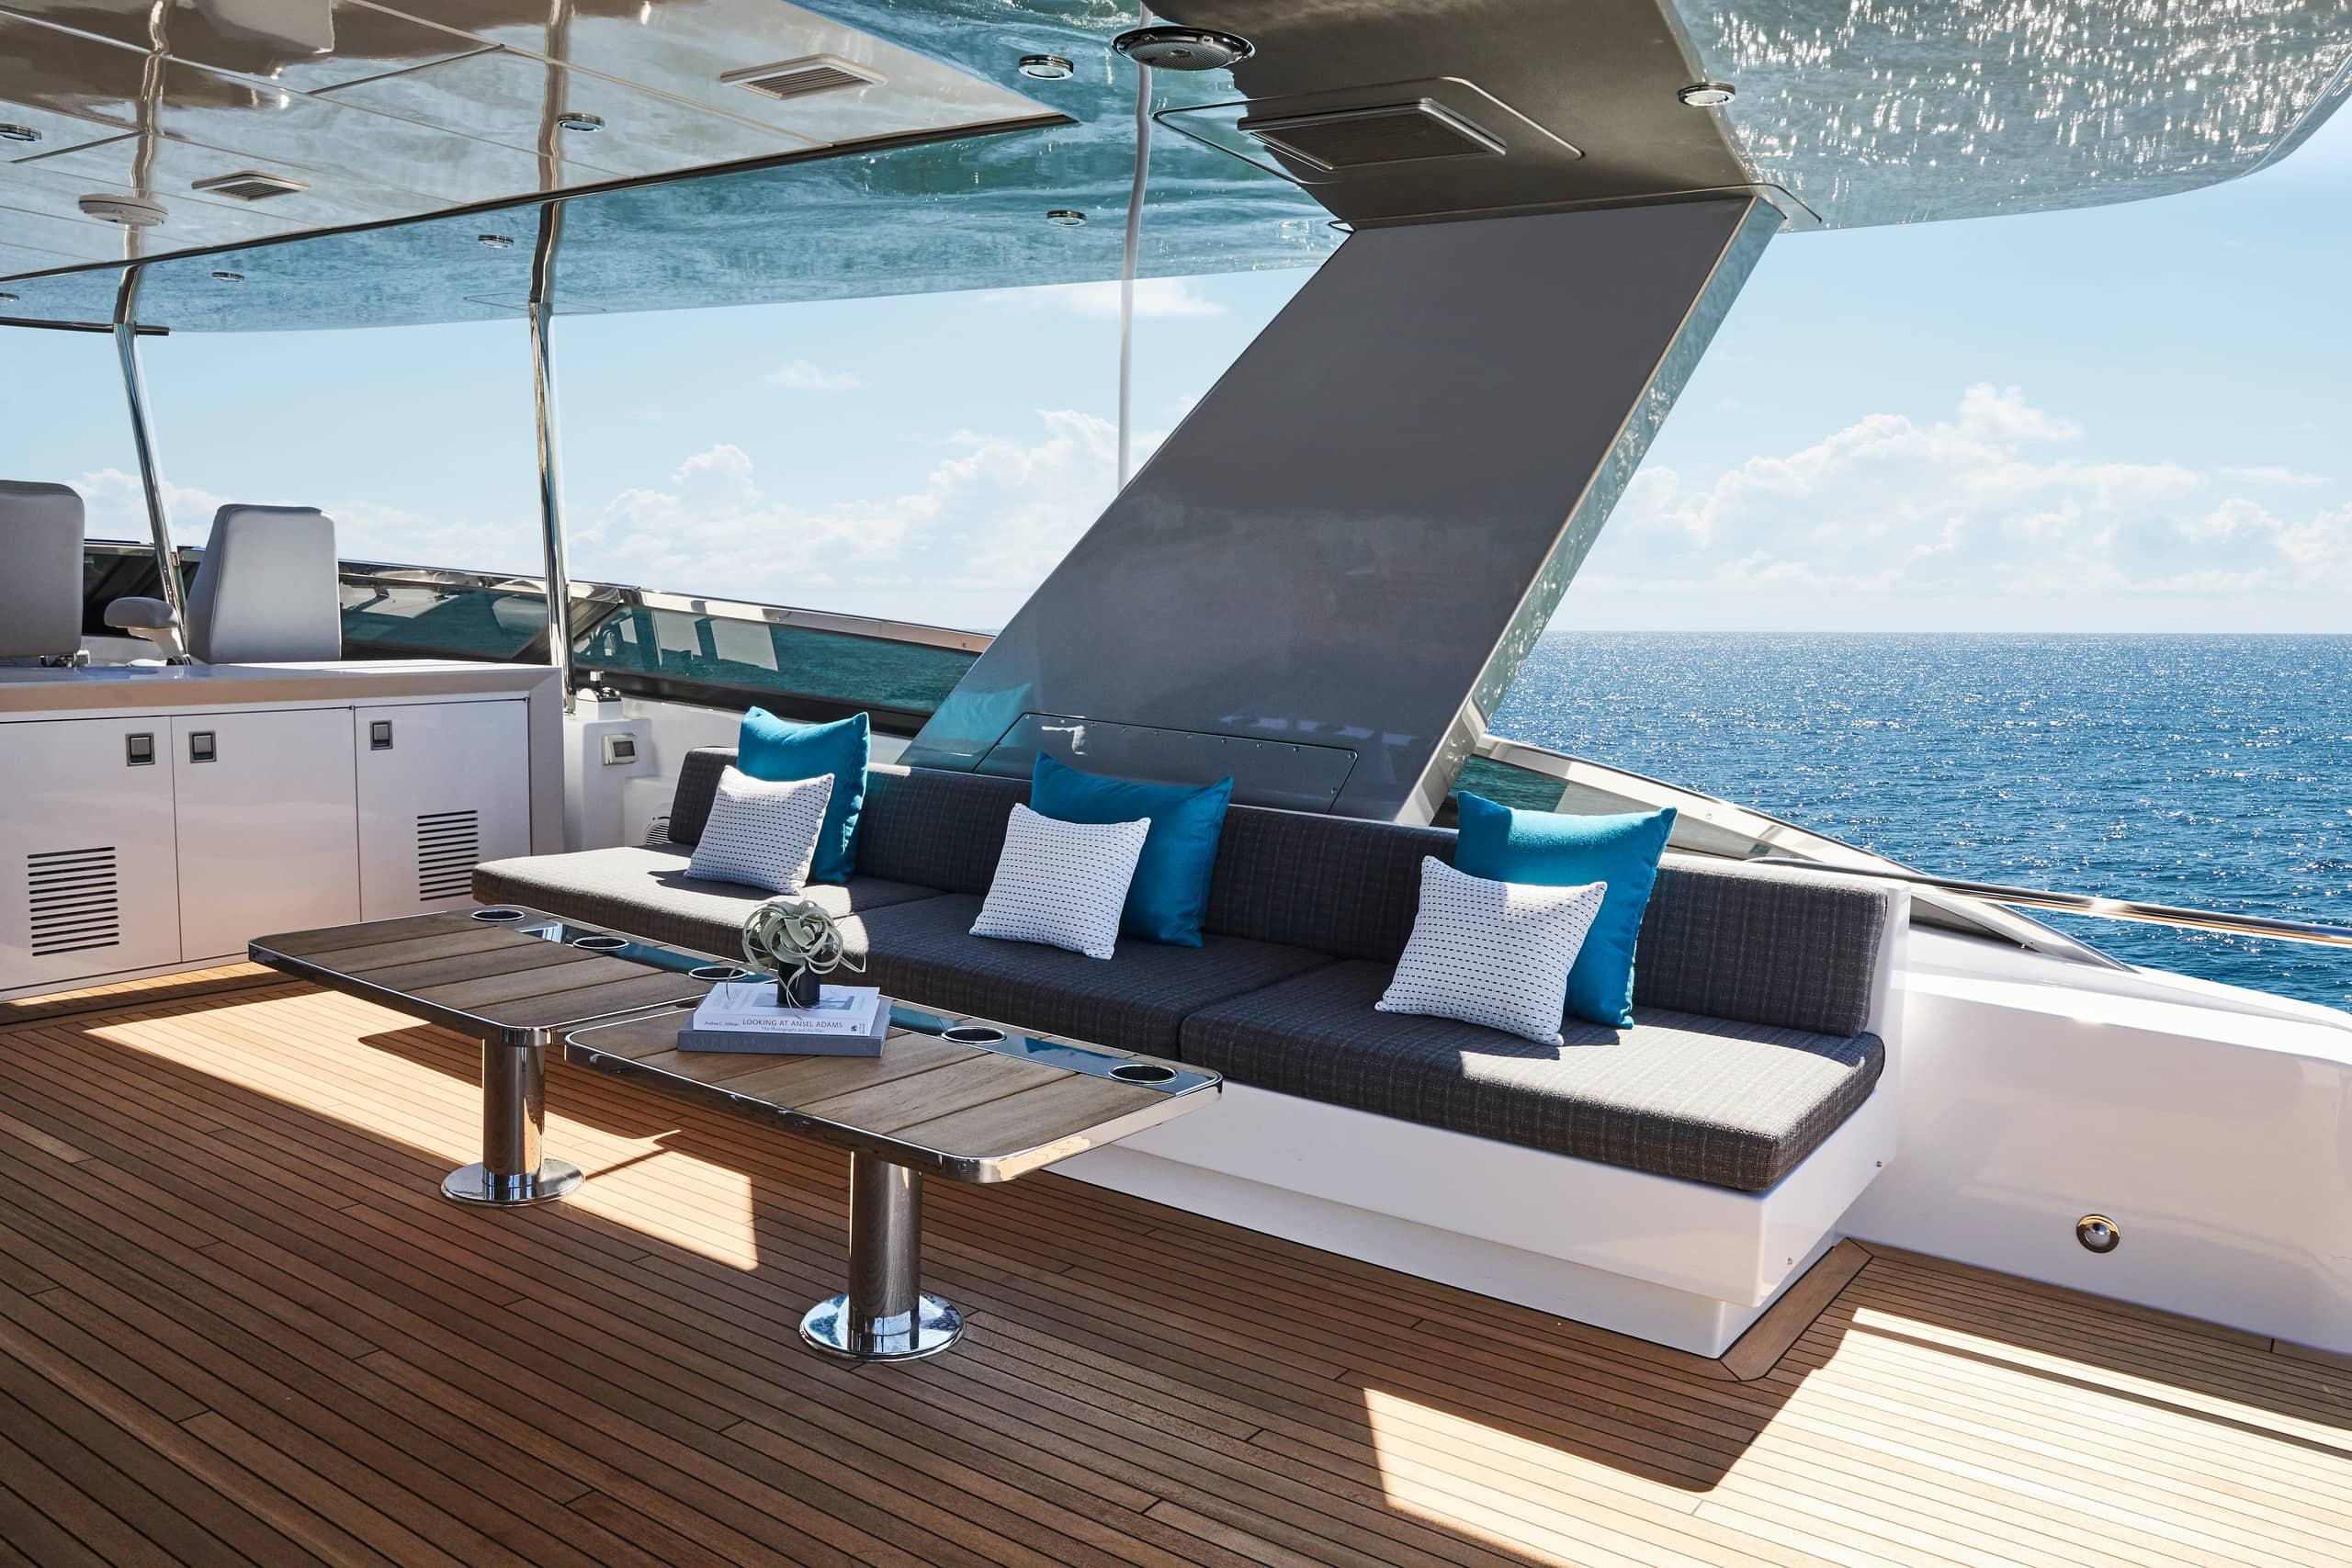 Hatteras M90 Panacera Top Deck Starboard